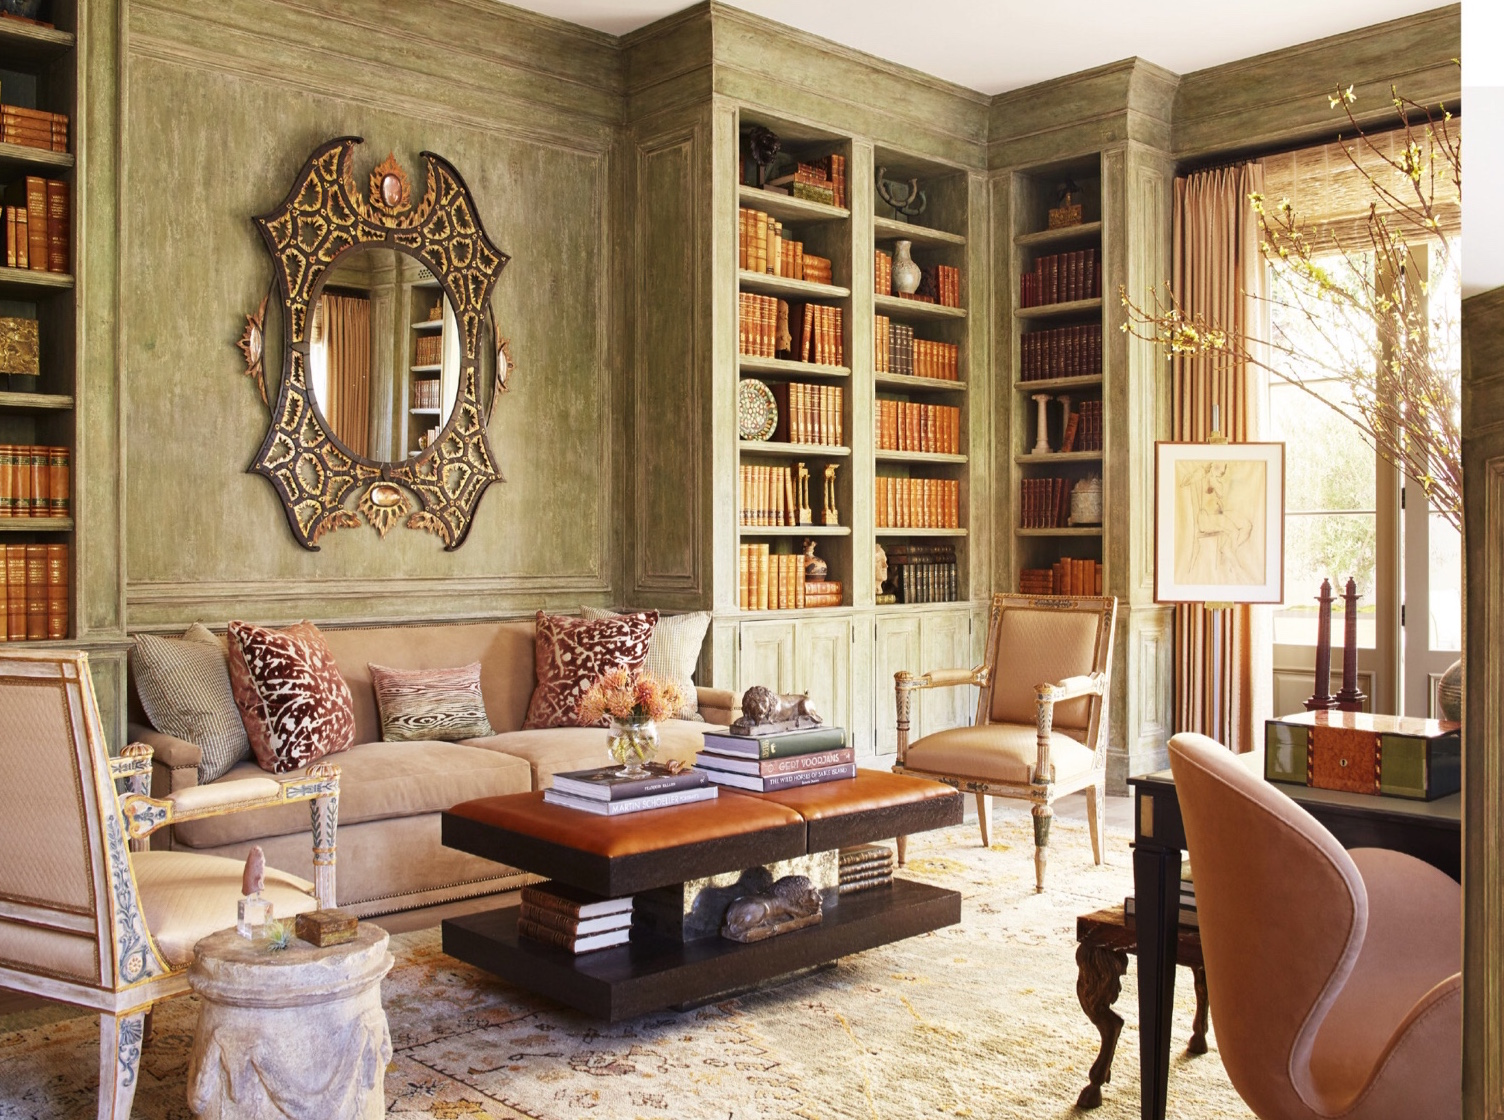 Richard hallberg design in montecito kelseycherry for Richard hallberg interior design